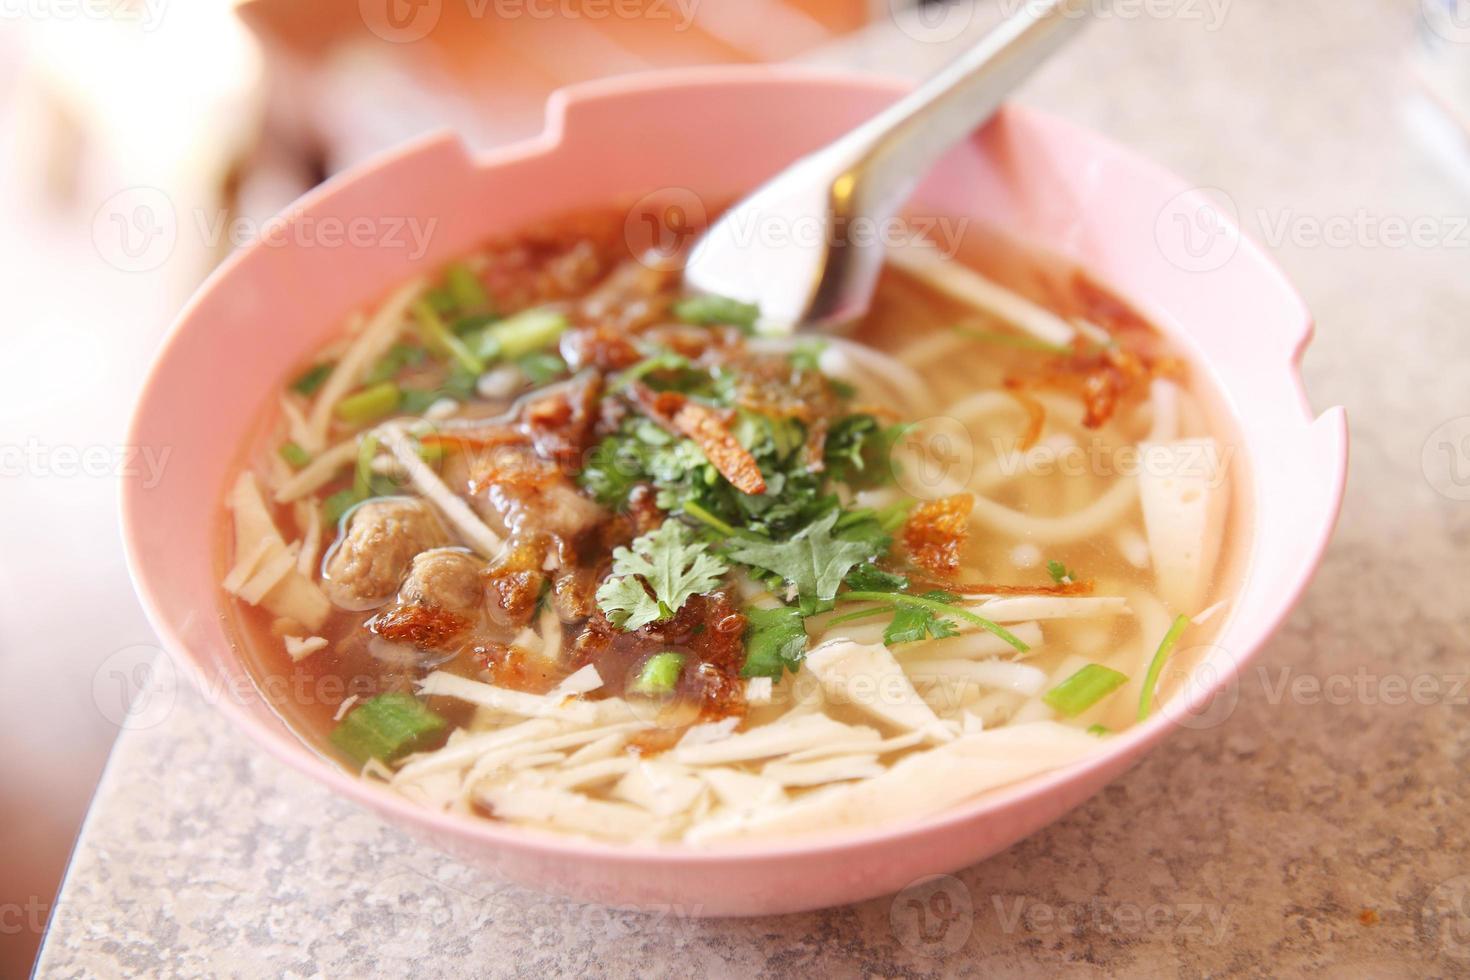 vietnamesisk nudel foto